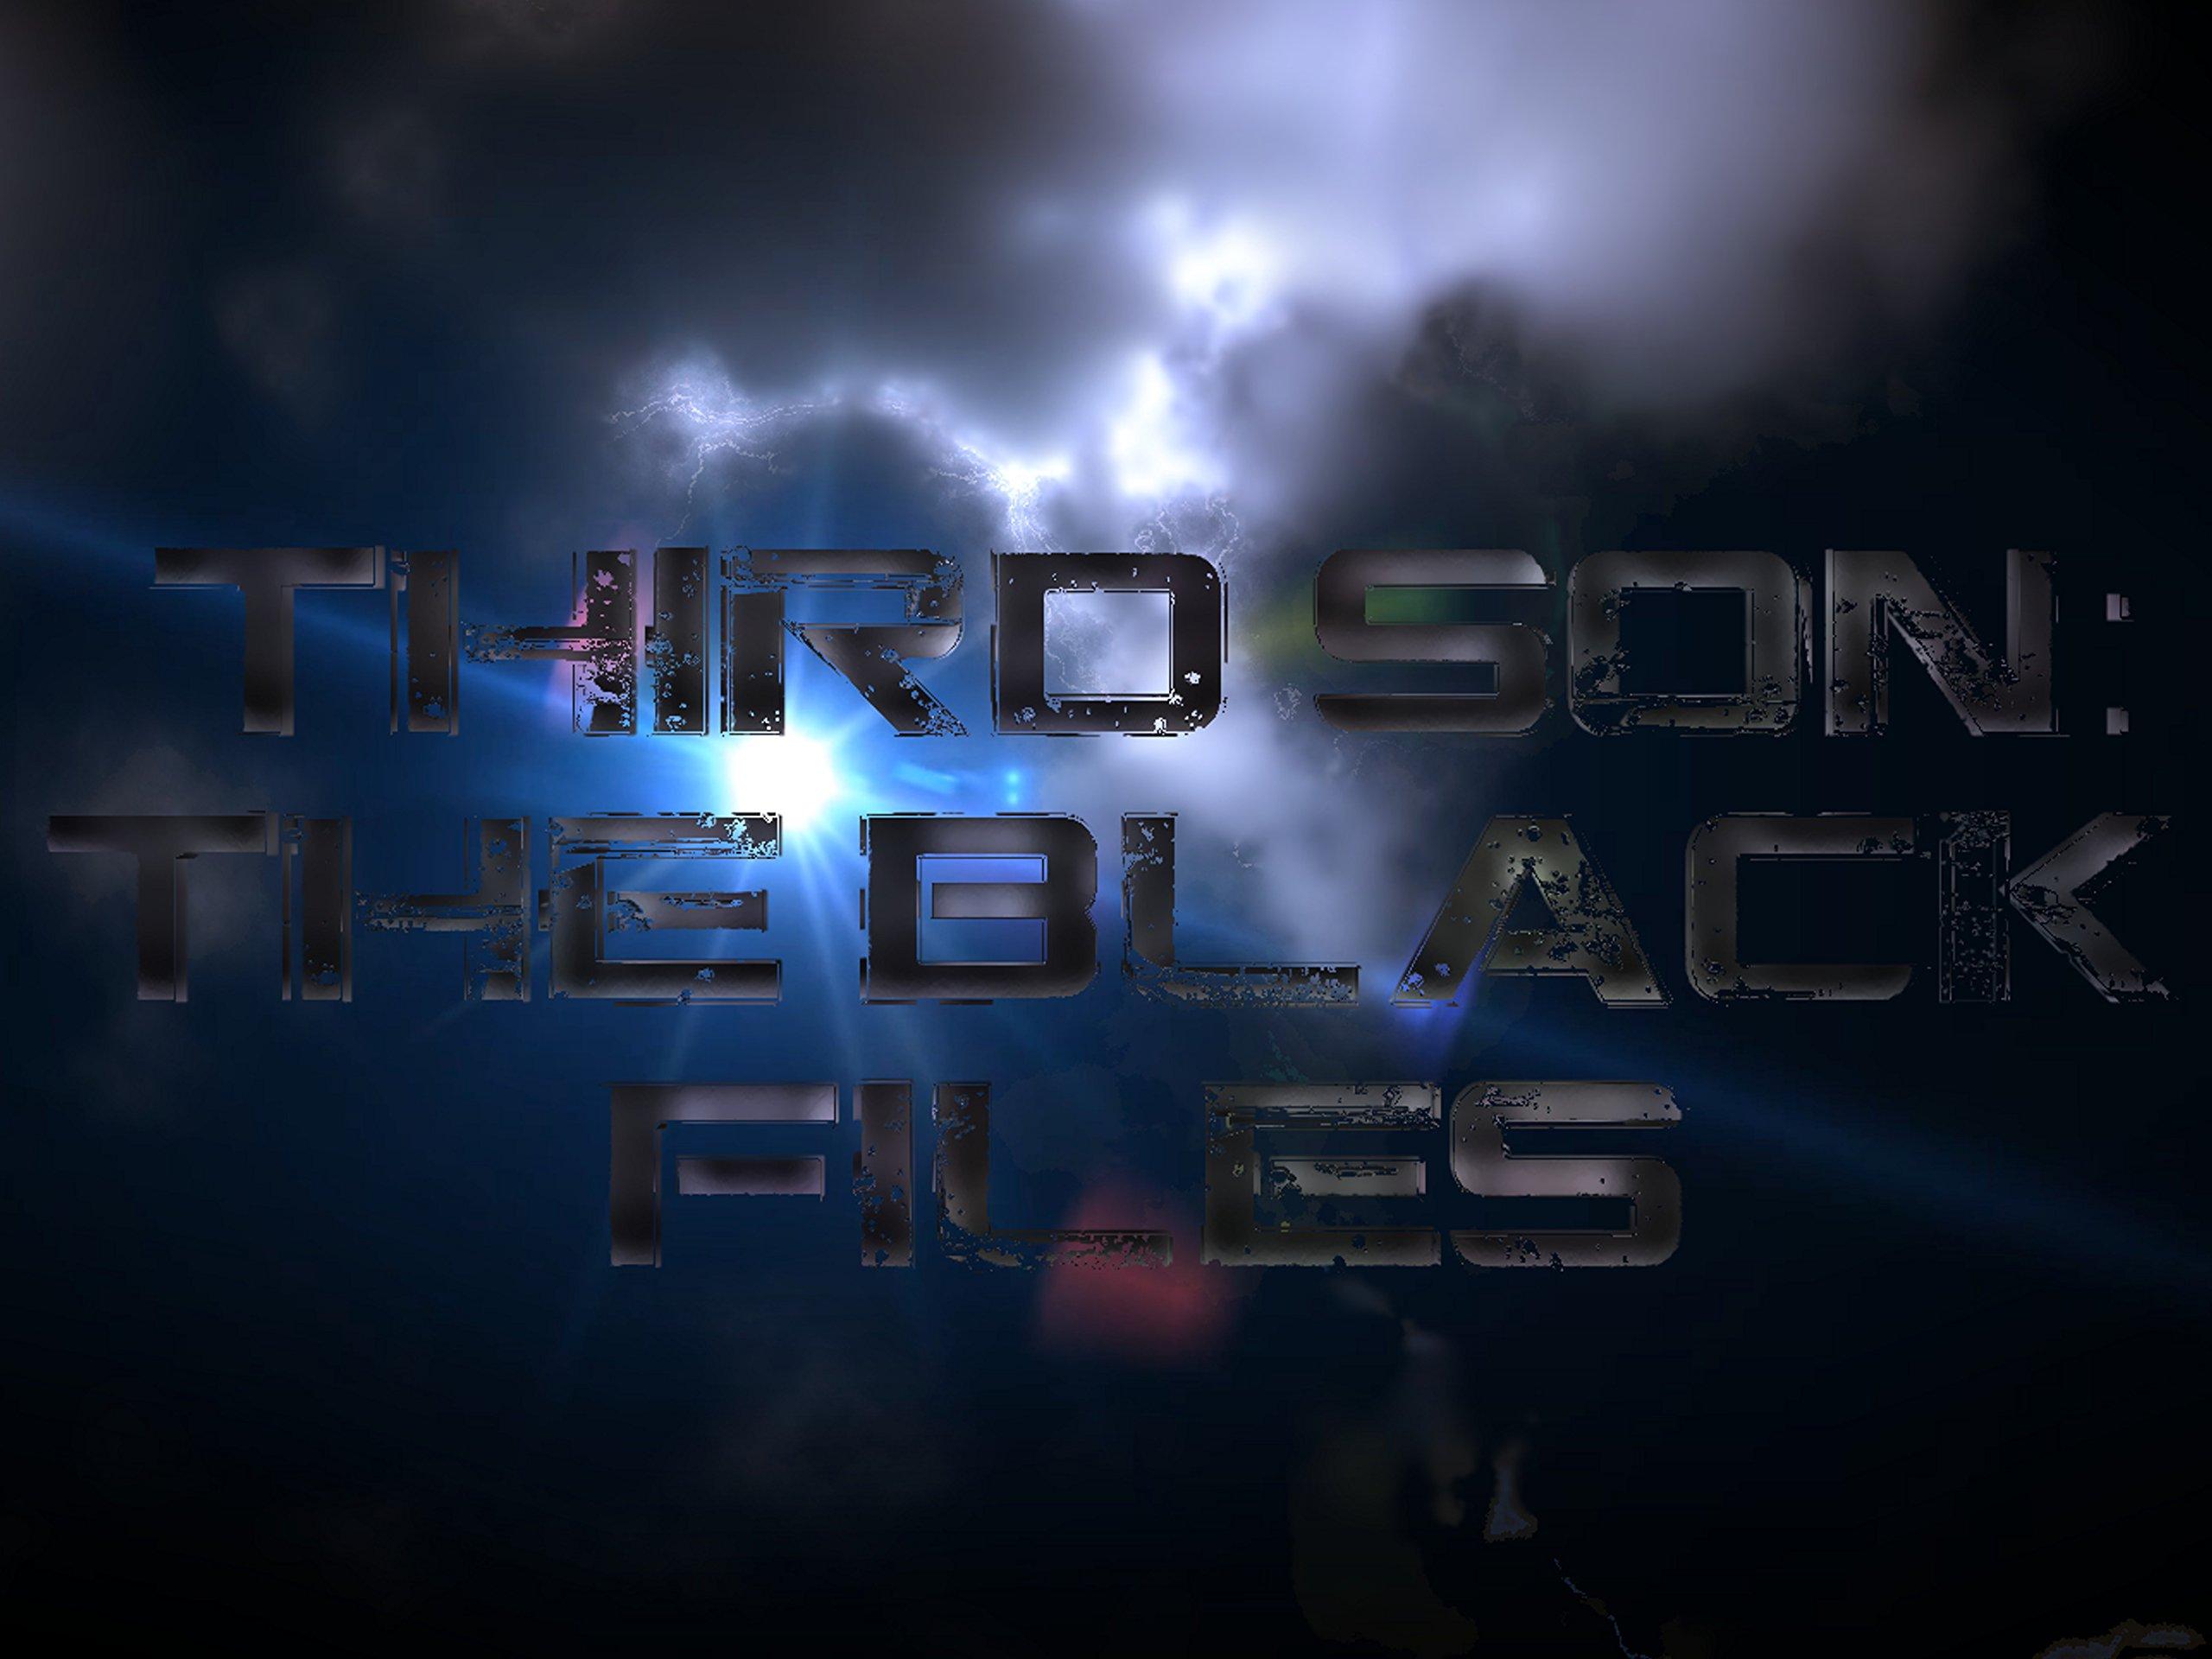 Third Son: The Black Files